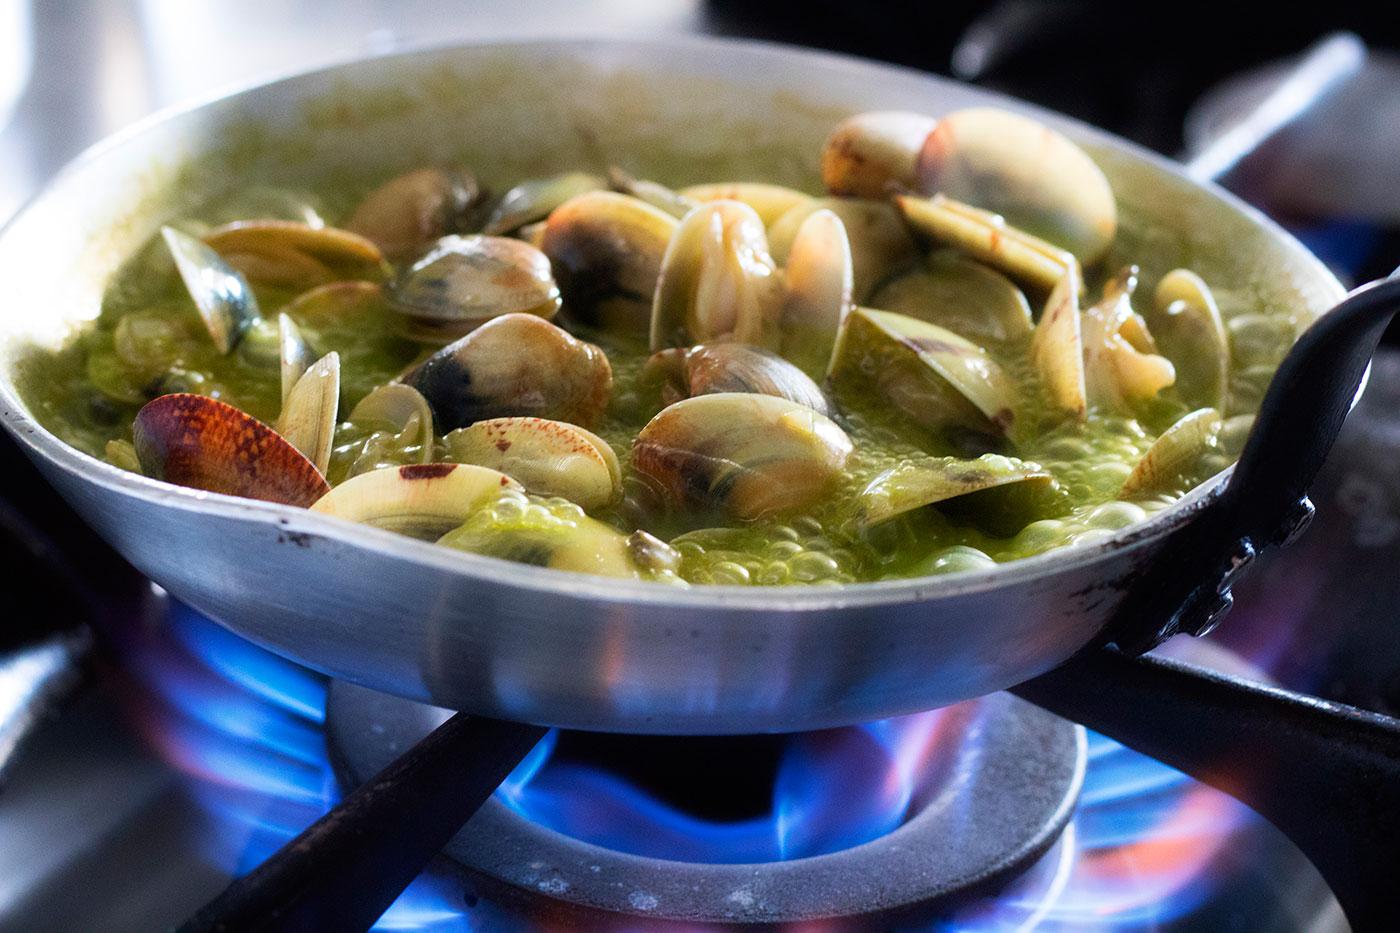 almejas-carril-codium-loxe-abastos2.0-elfotogastro-fotografo-de-comida-fotografo-gastronomico